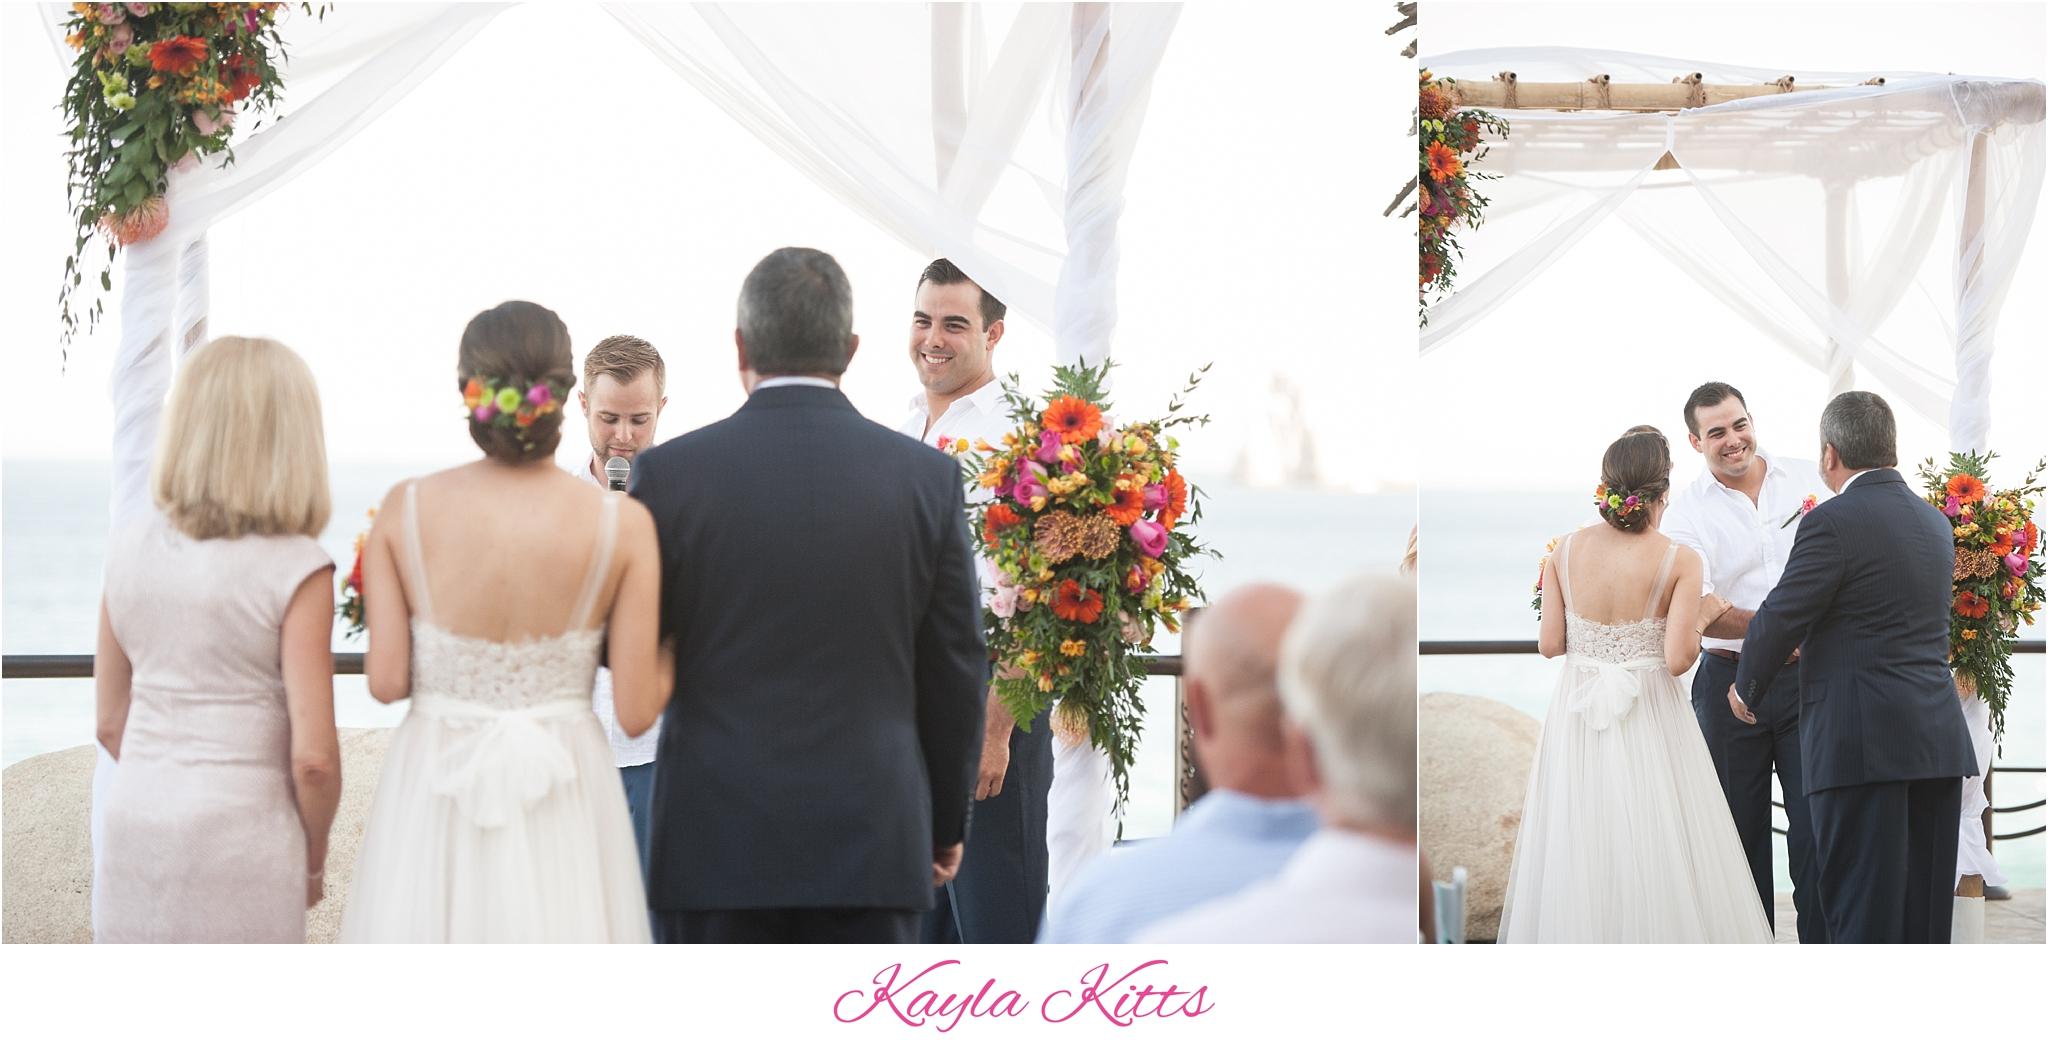 kayla kitts photography-travis and sarah-cabo wedding-cabo wedding photographer-destination wedding photographer-paris wedding photographer-albuquerque wedding-matt jones-albuquerque wedding vendor-intimate wedding_0014.jpg